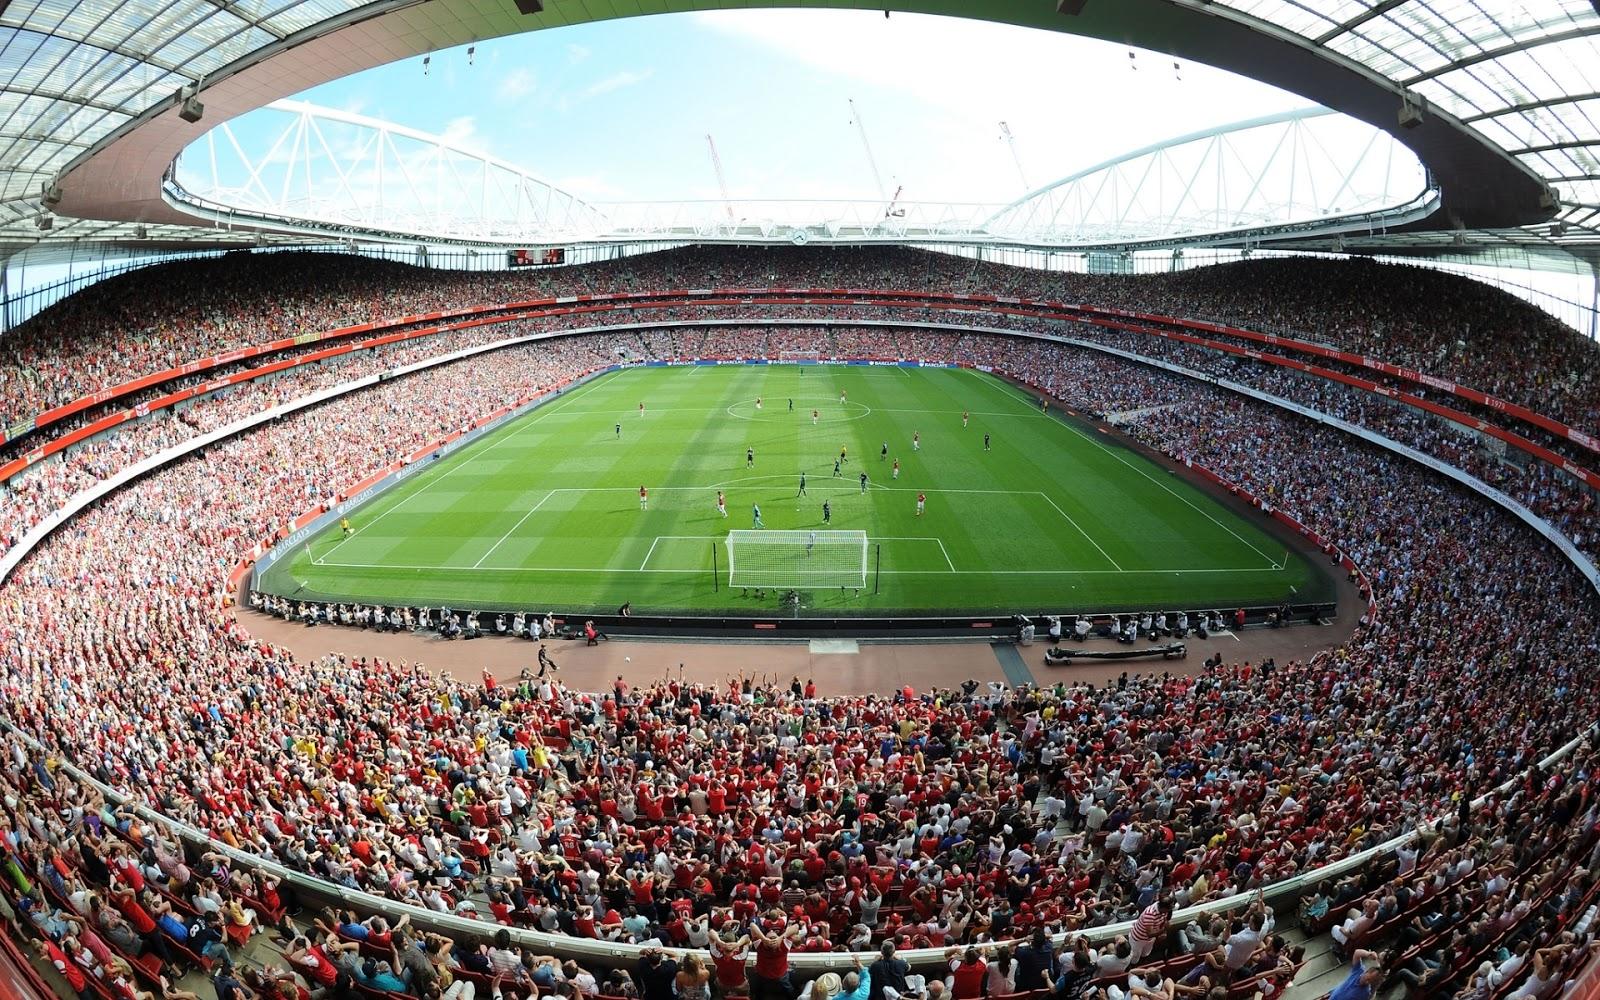 Wallpapers Hd For Mac: Emirates Stadium Wallpaper